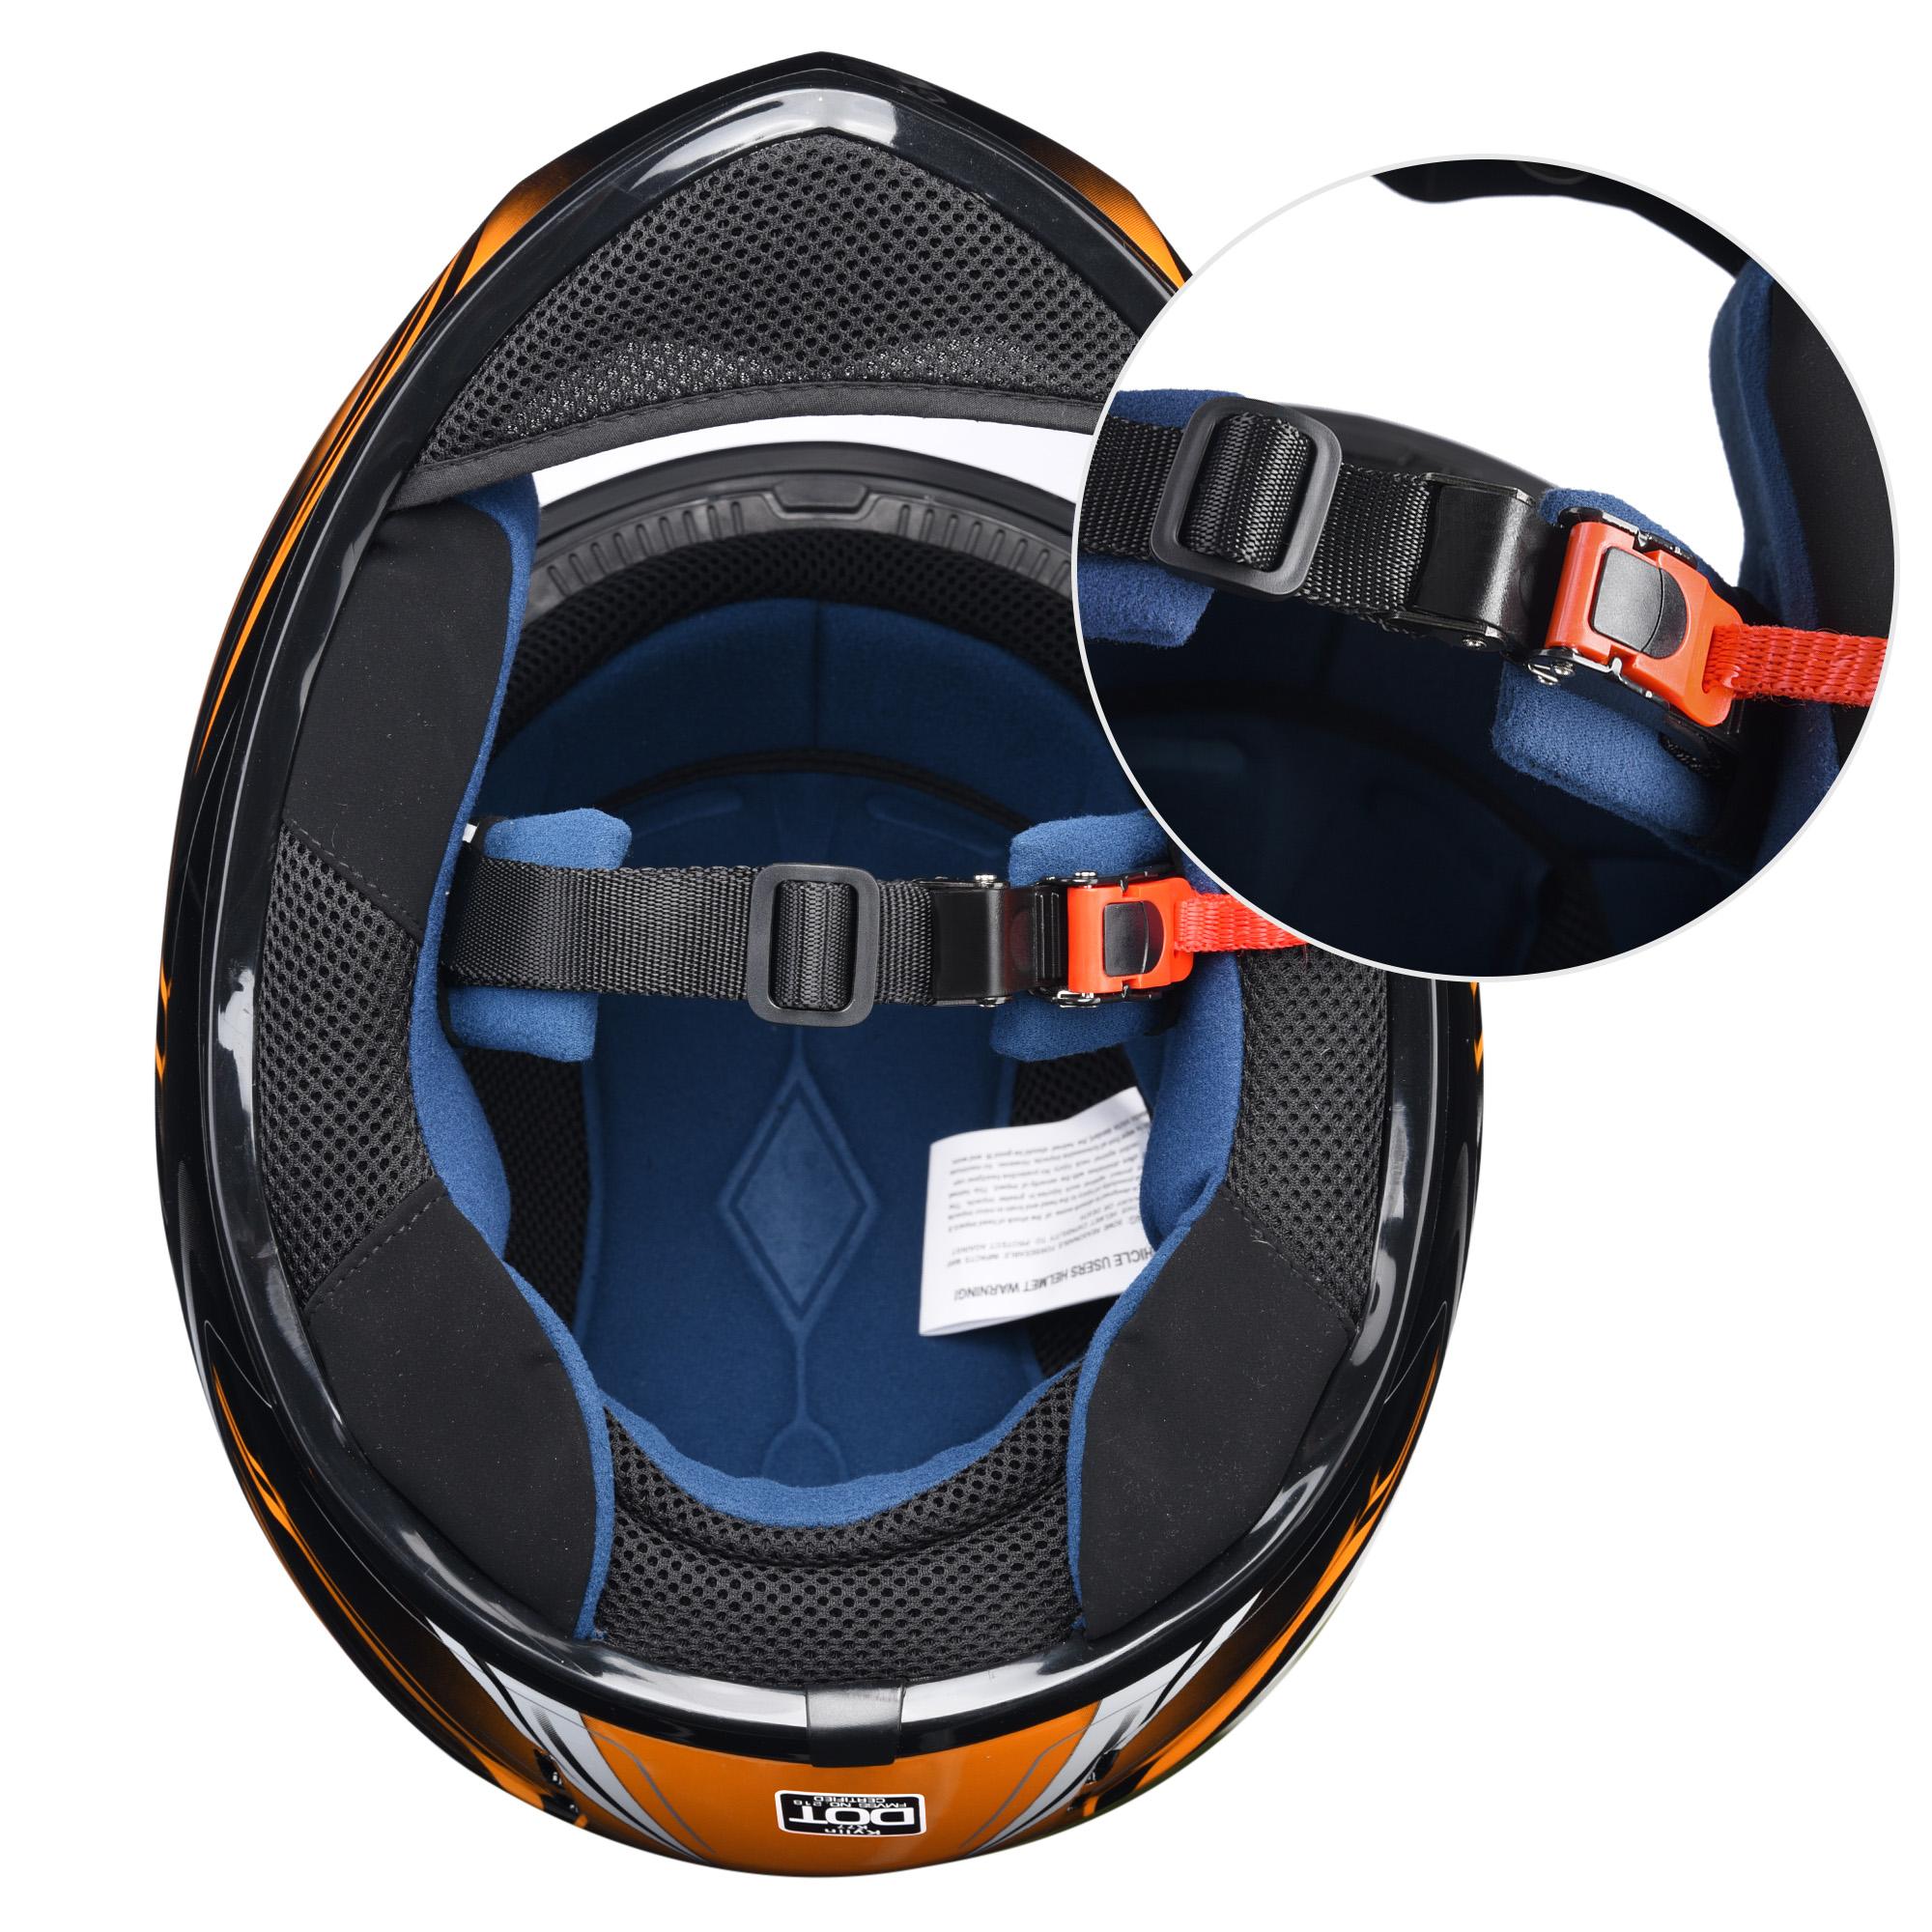 miniature 44 - AHR K12 Full Face Motorcycle Helmet DOT Air Vents Clear Visor Racing S M L XL